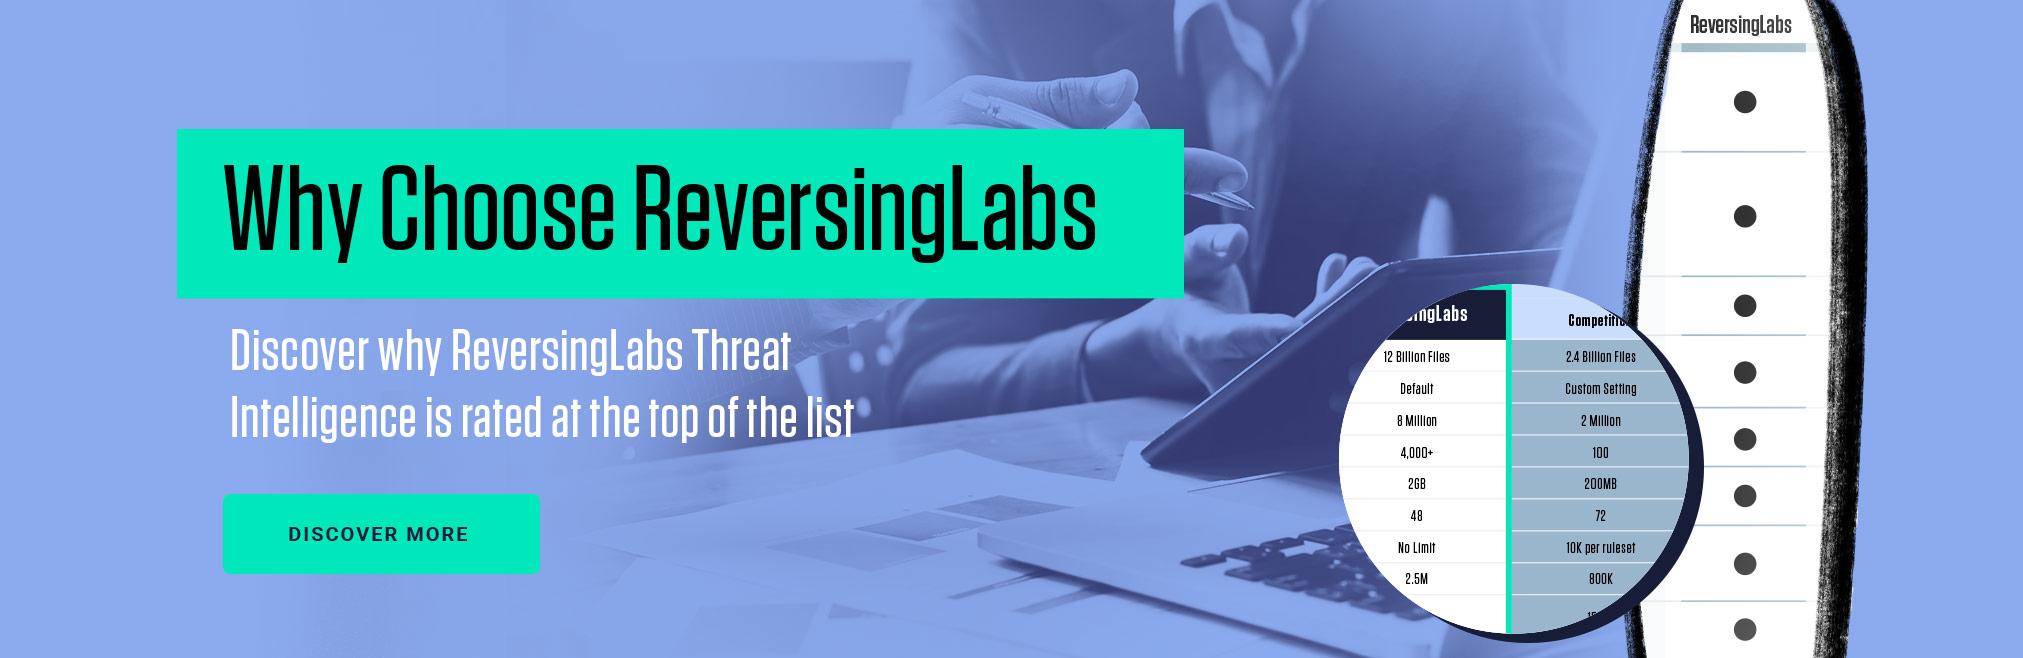 Why Choose ReversingLabs